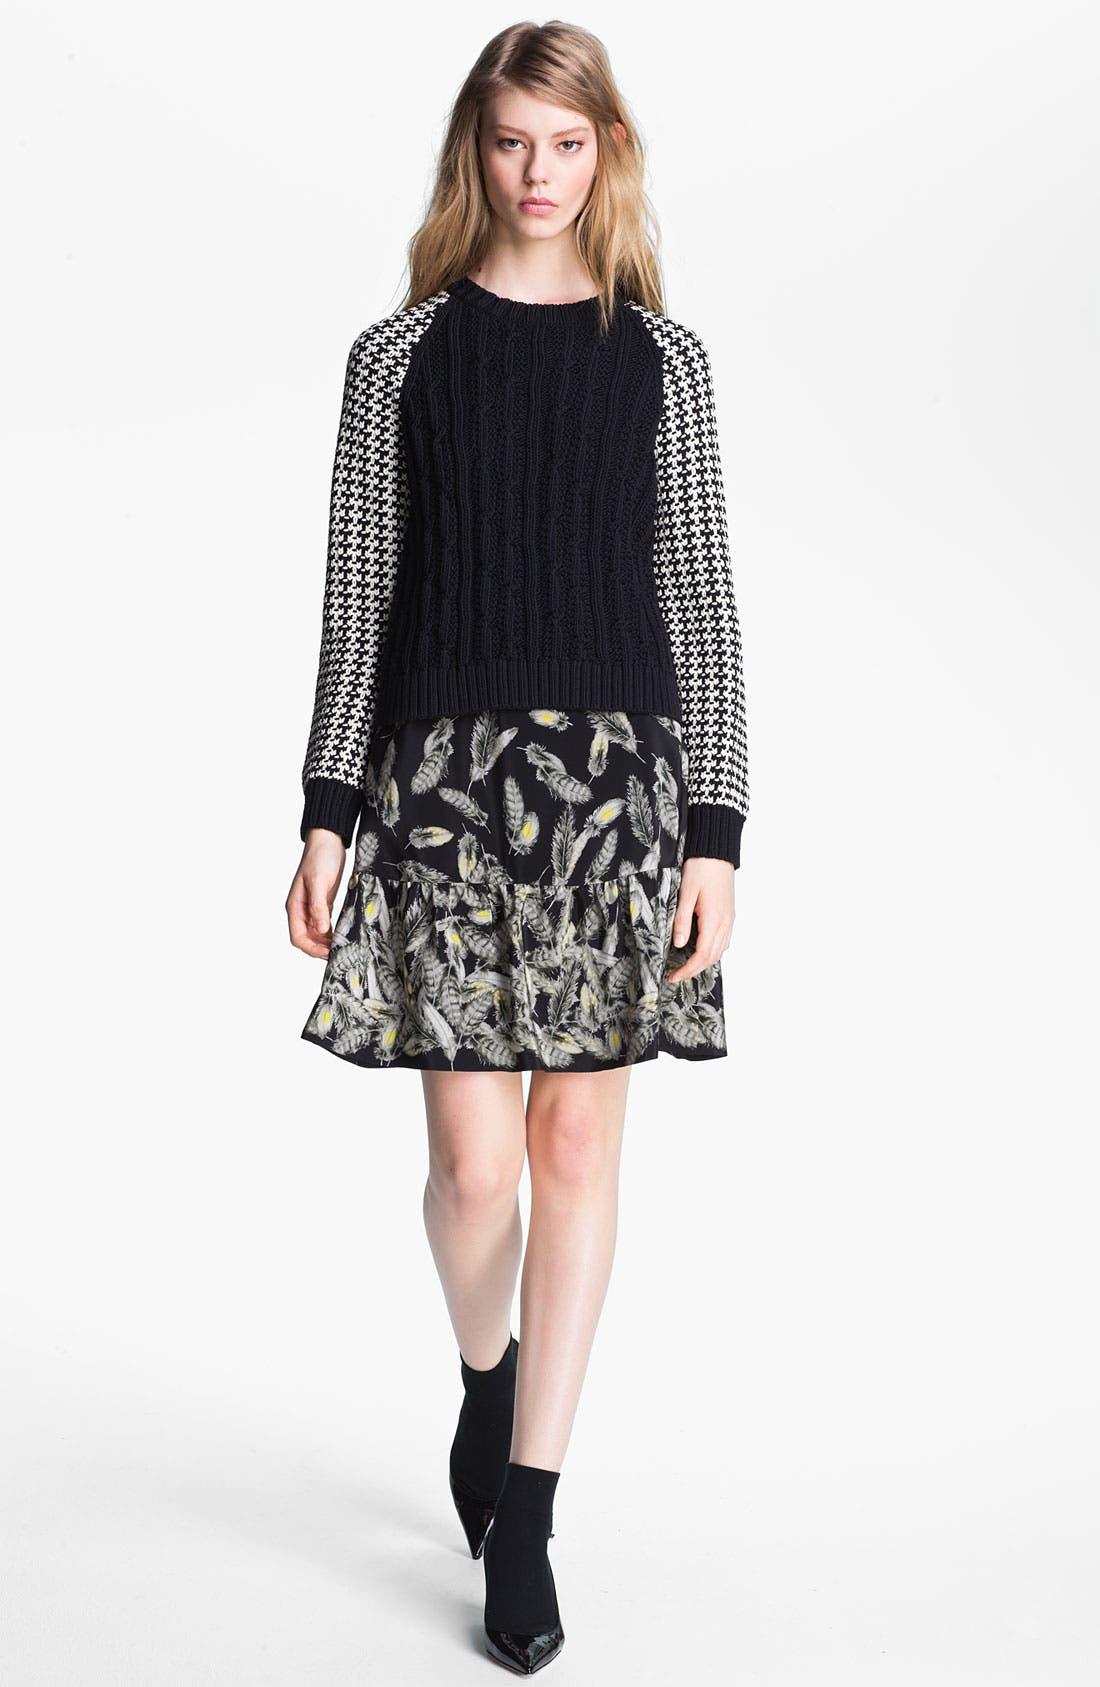 Alternate Image 1 Selected - Miss Wu Contrast Sleeve Sweater (Nordstrom Exclusive)